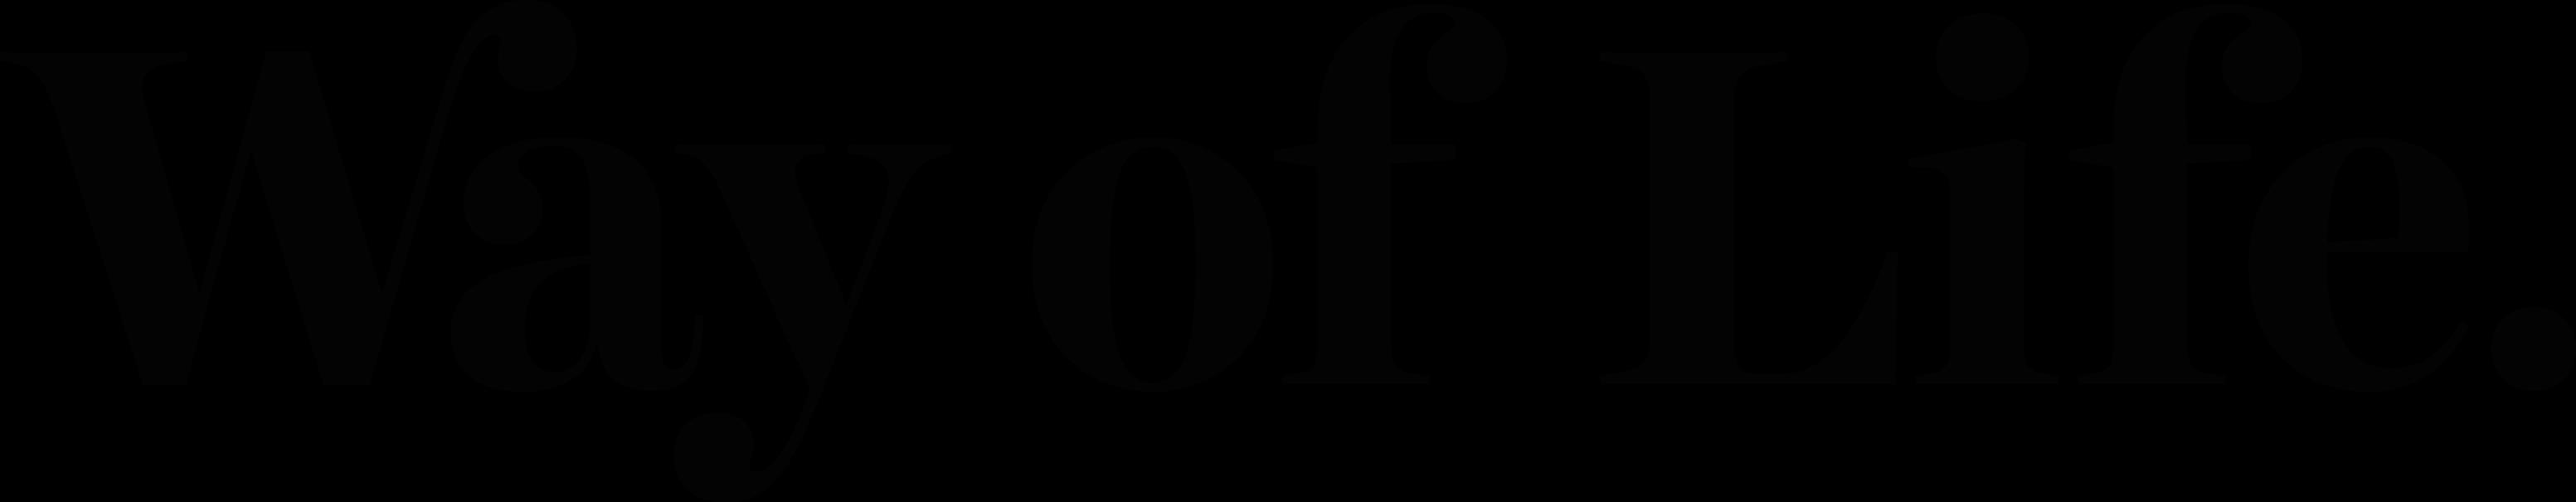 WayOfLife_Logo_Black_RGB